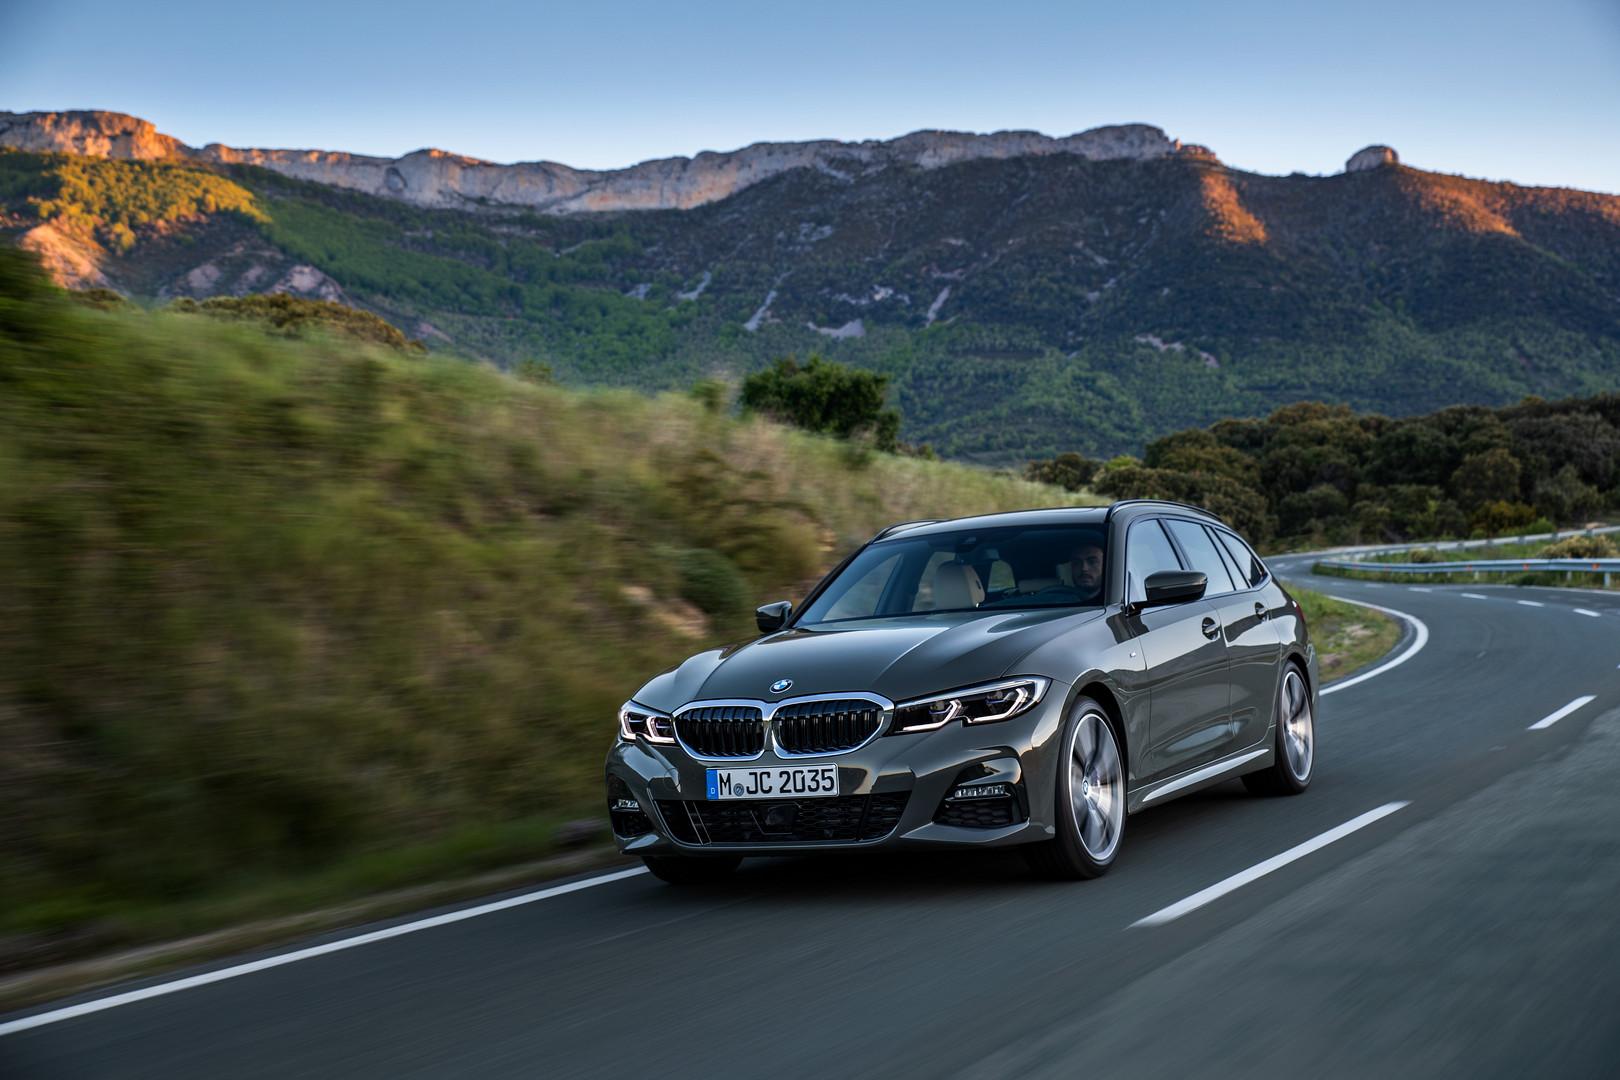 2020 BMW G21 3 Series Touring is Here - GTspirit